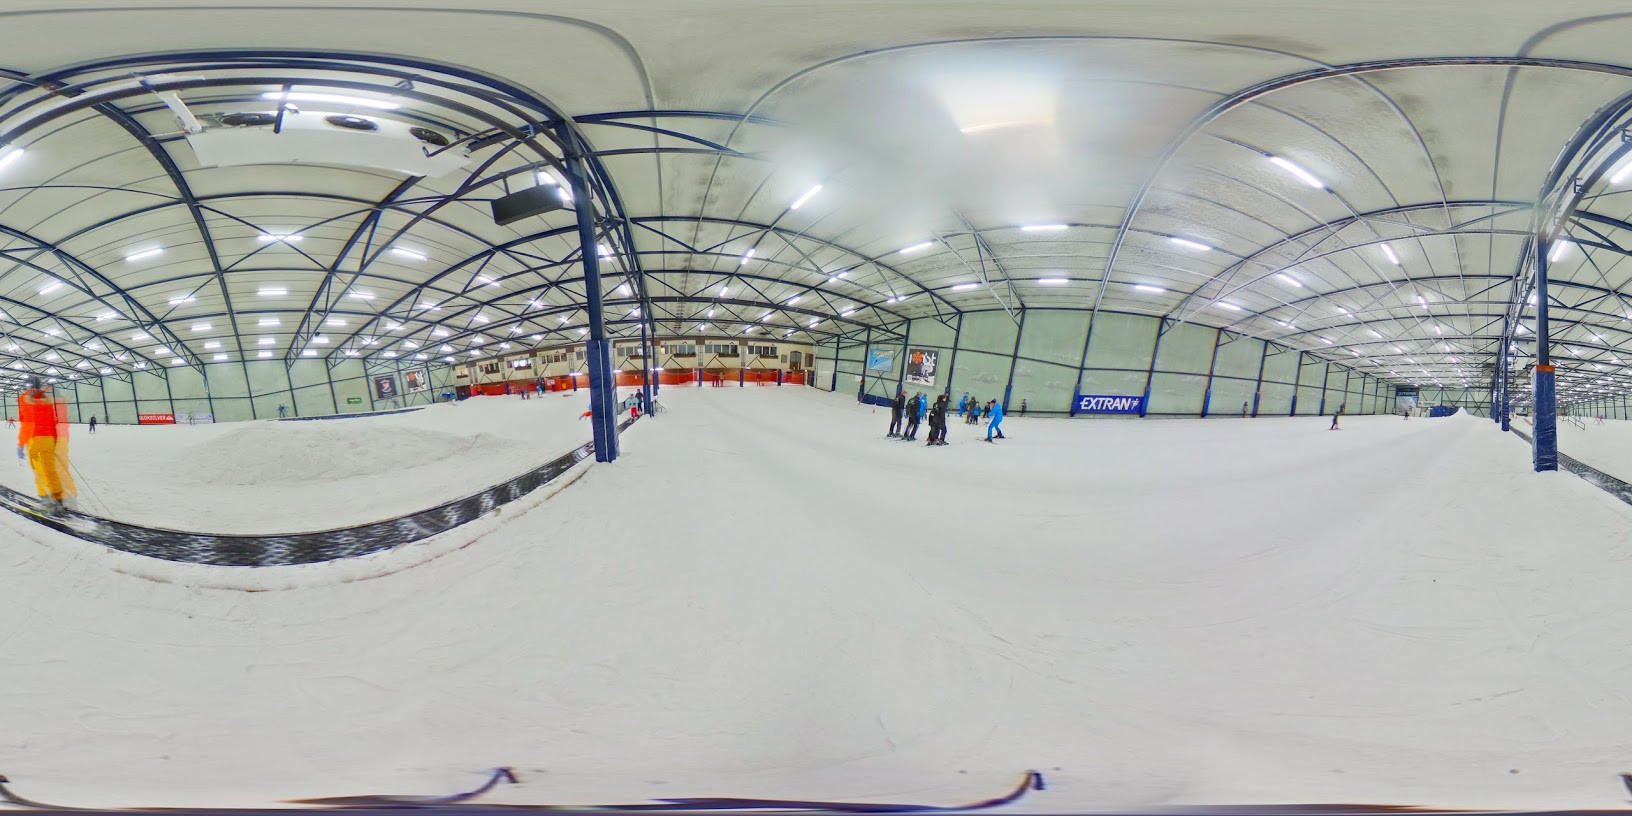 Montana Snowcenter Kempervennen Westerhoven